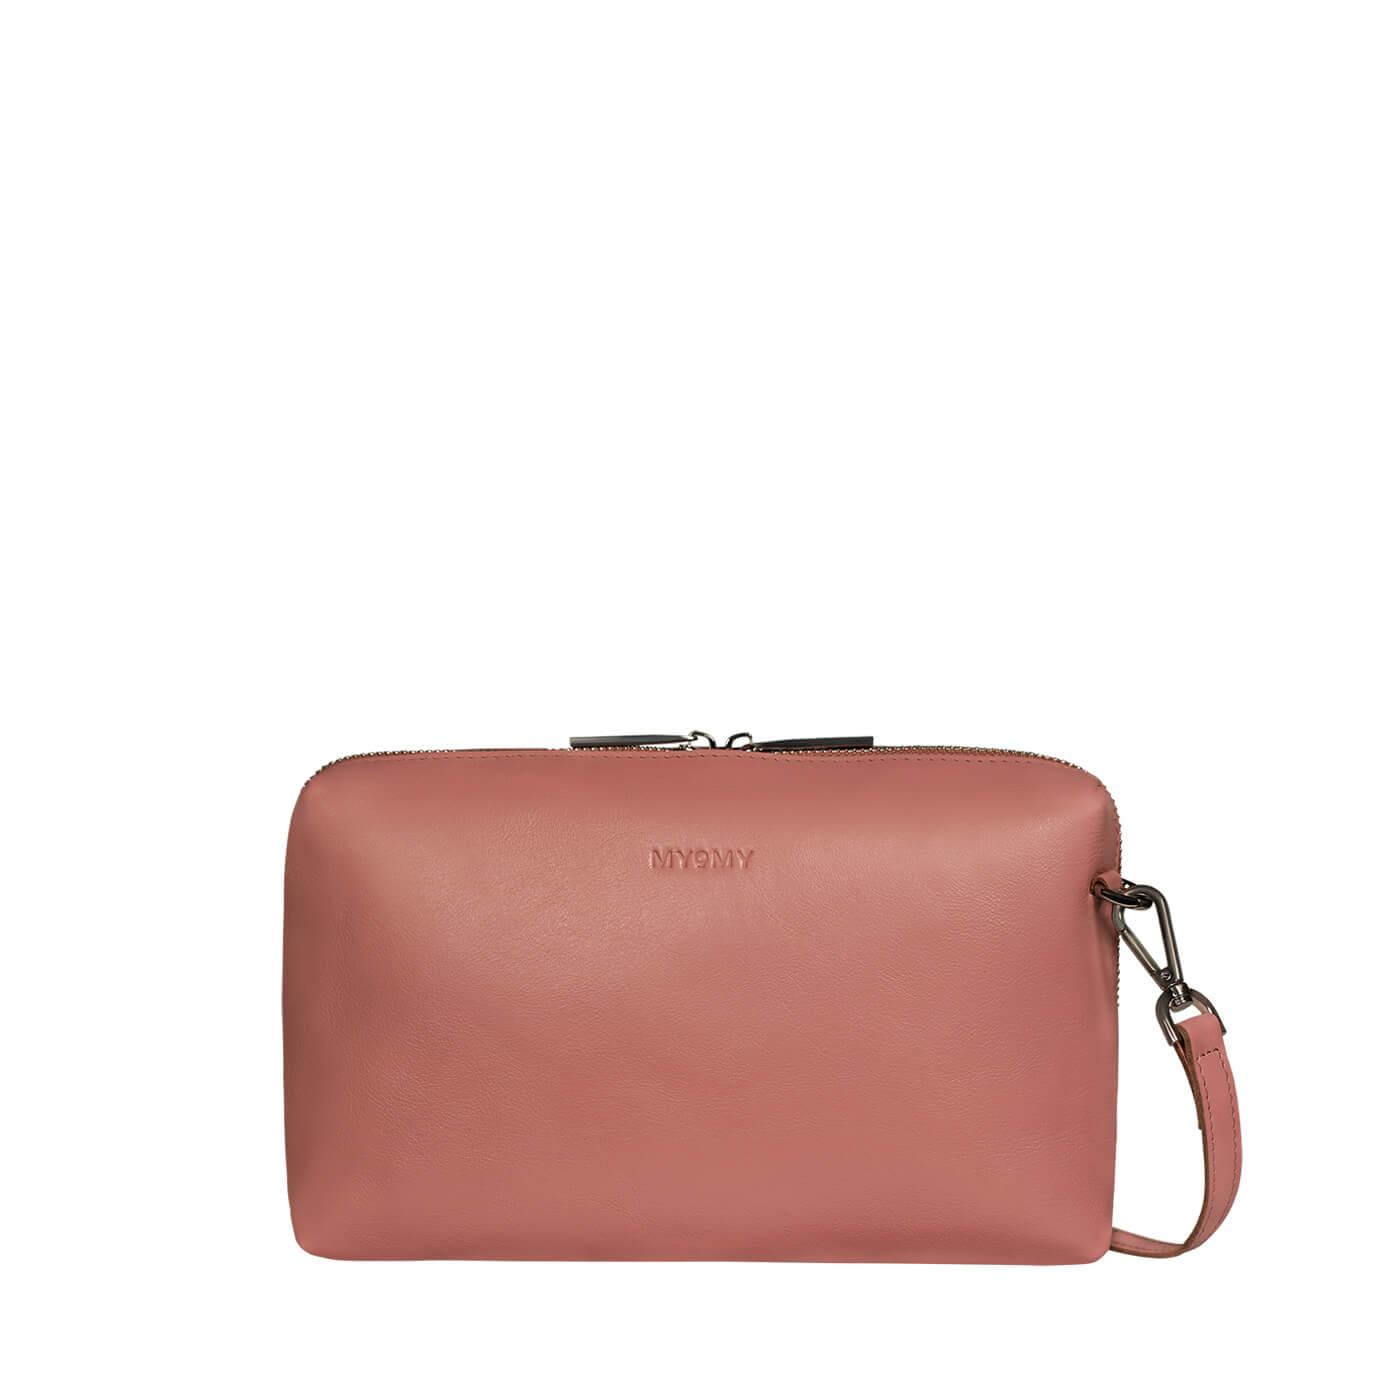 MY BOXY BAG Handbag - hunter waxy pink